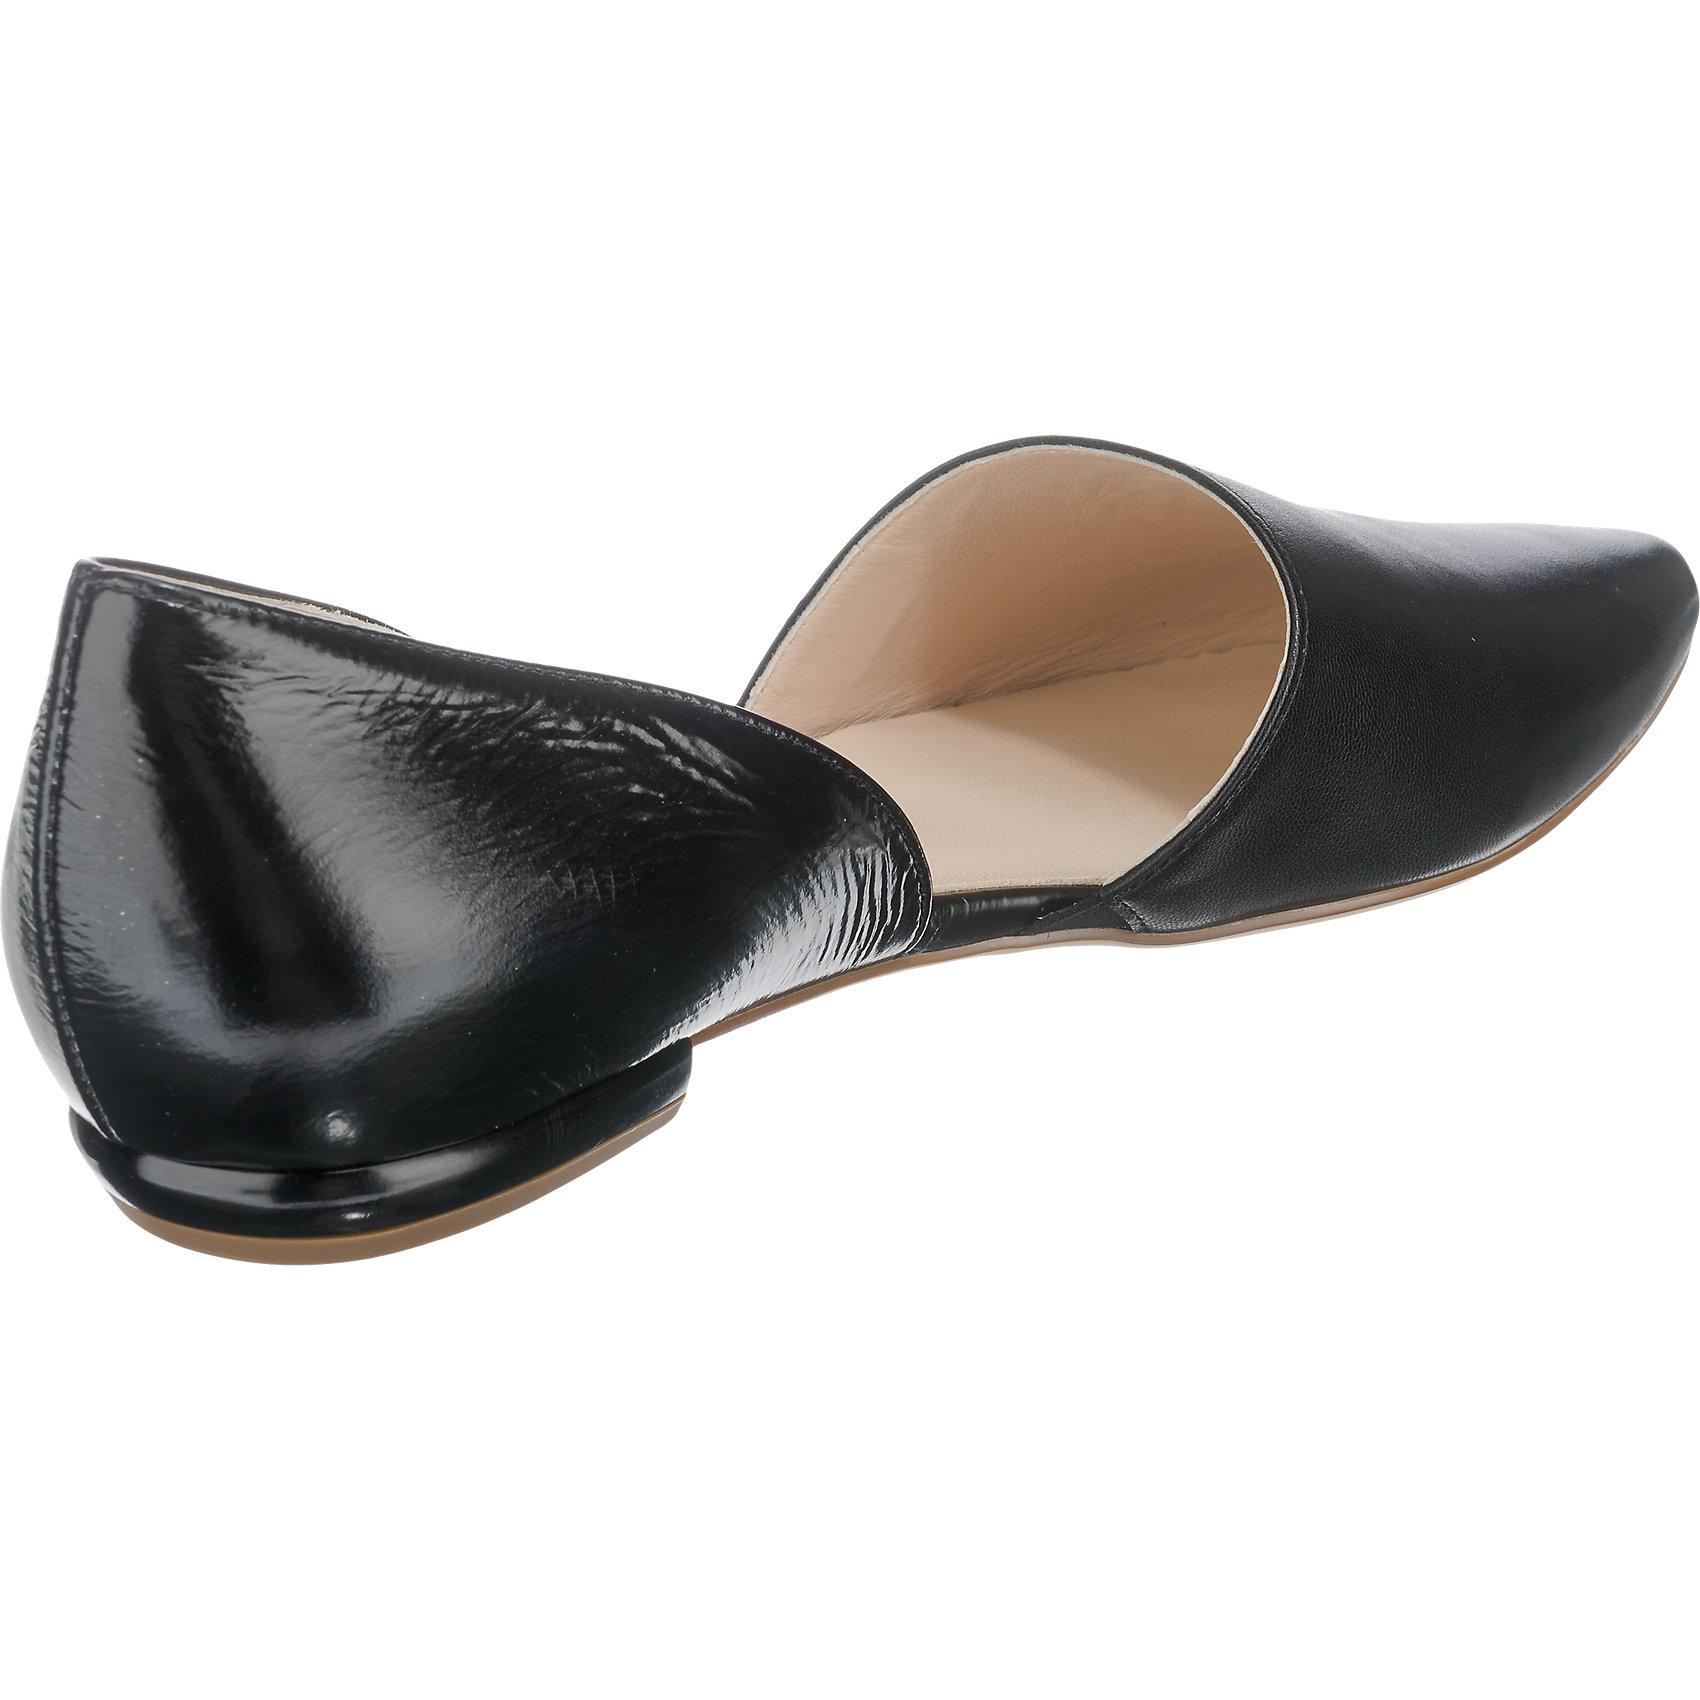 Details zu Neu högl Ballerinas silber schwarz 5767822